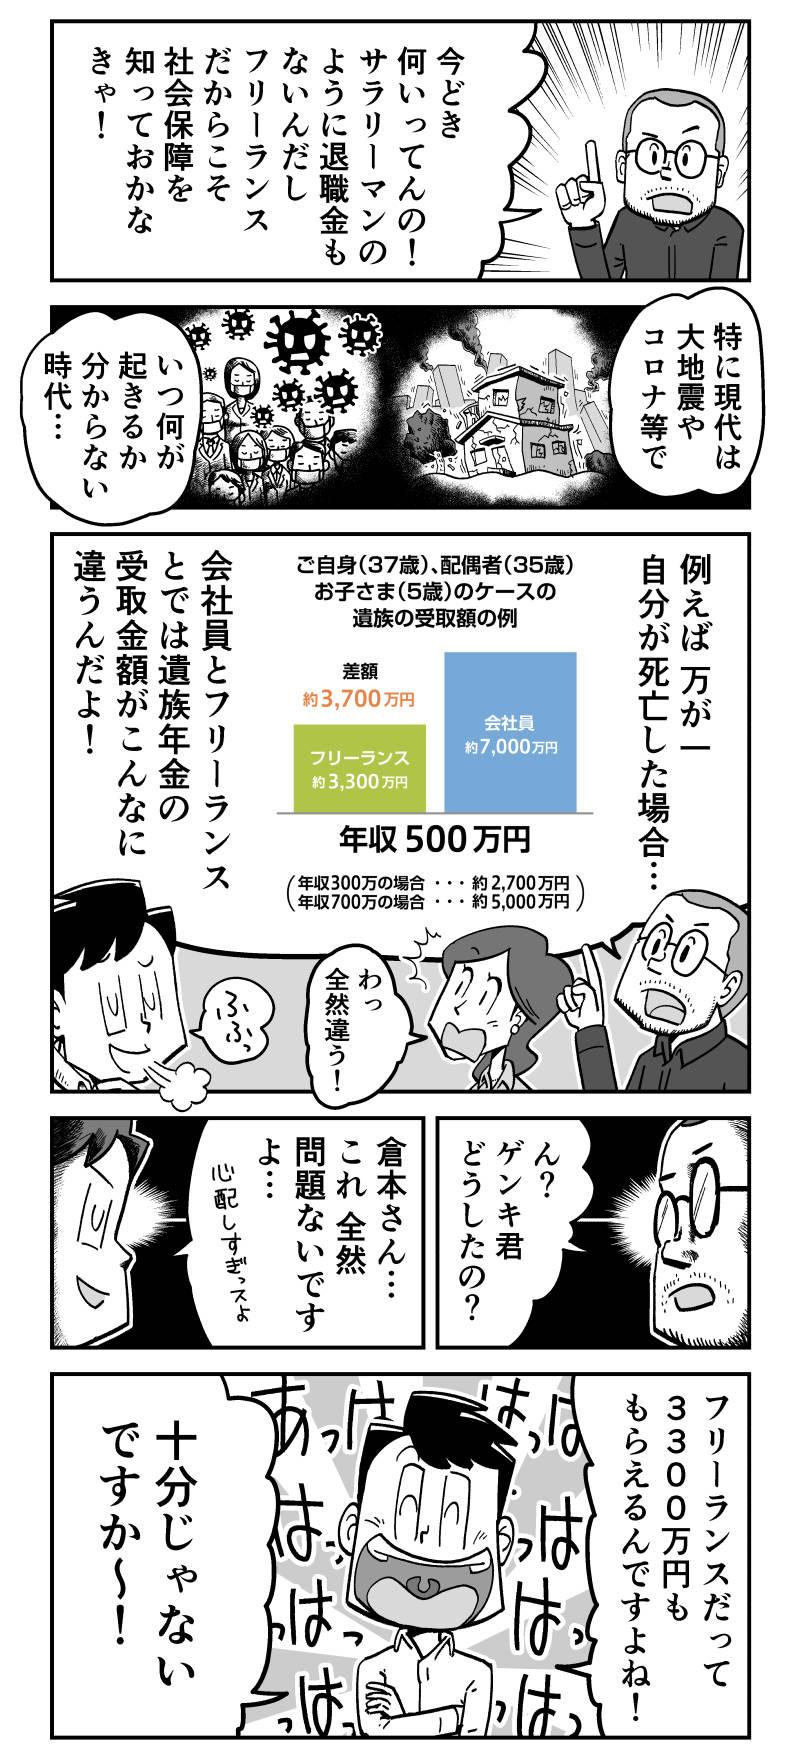 【PR漫画】フリーランスの保険はエヌエヌ生命で決まり!【自営業 遺族年金 漫画 広告】 フリーランス